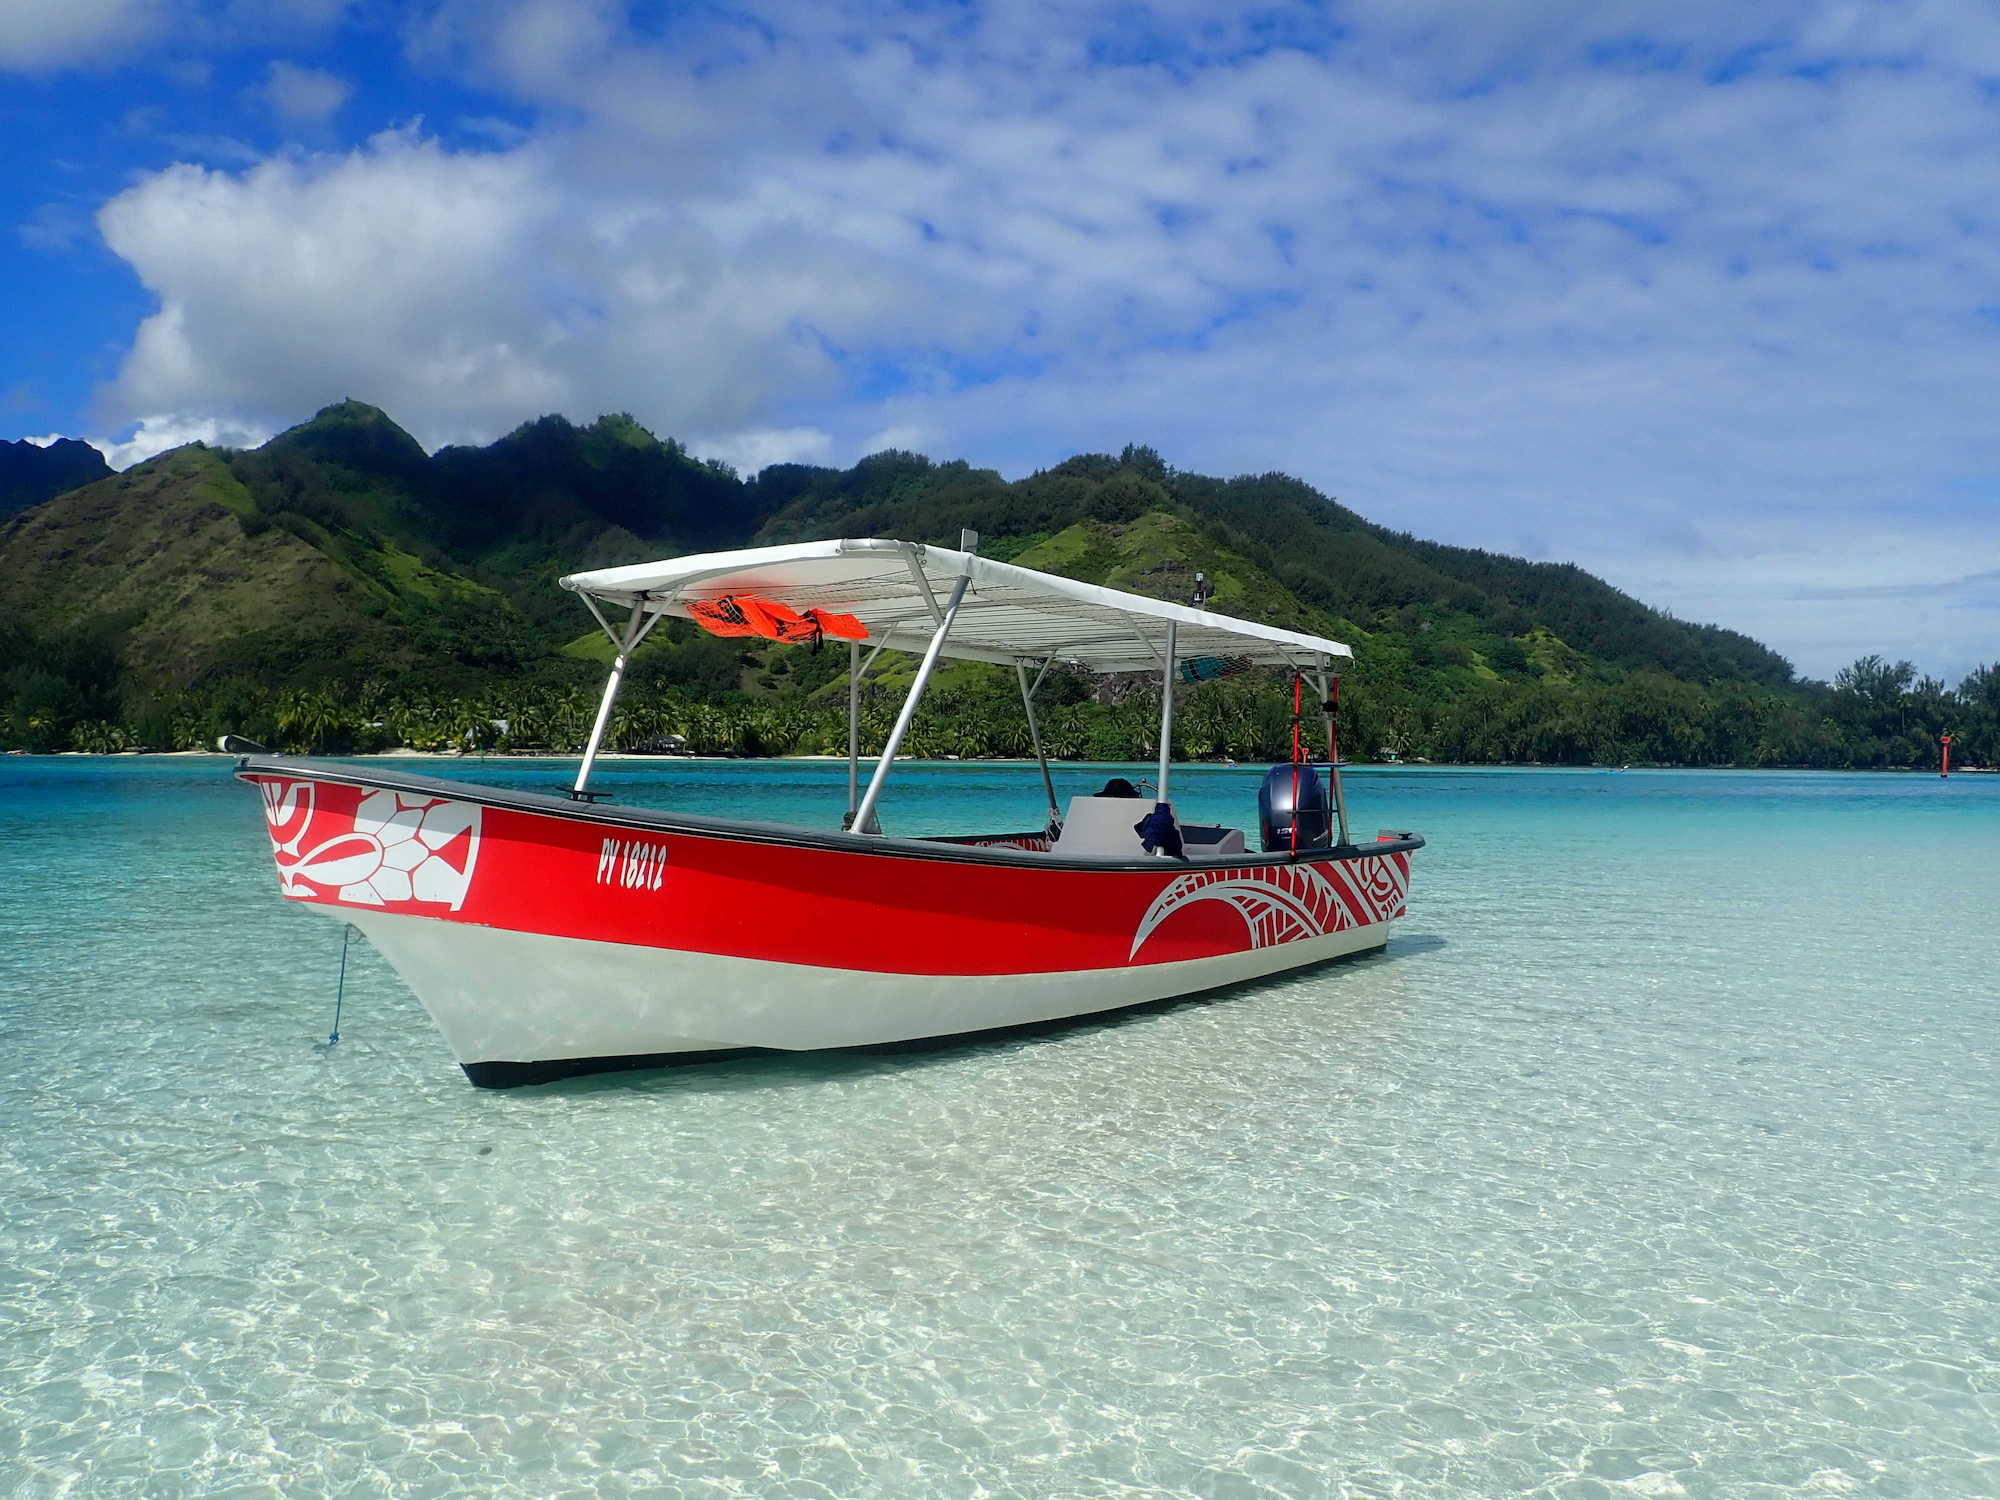 https://tahititourisme.ca/wp-content/uploads/2020/09/Boat-Hinaloa.jpg